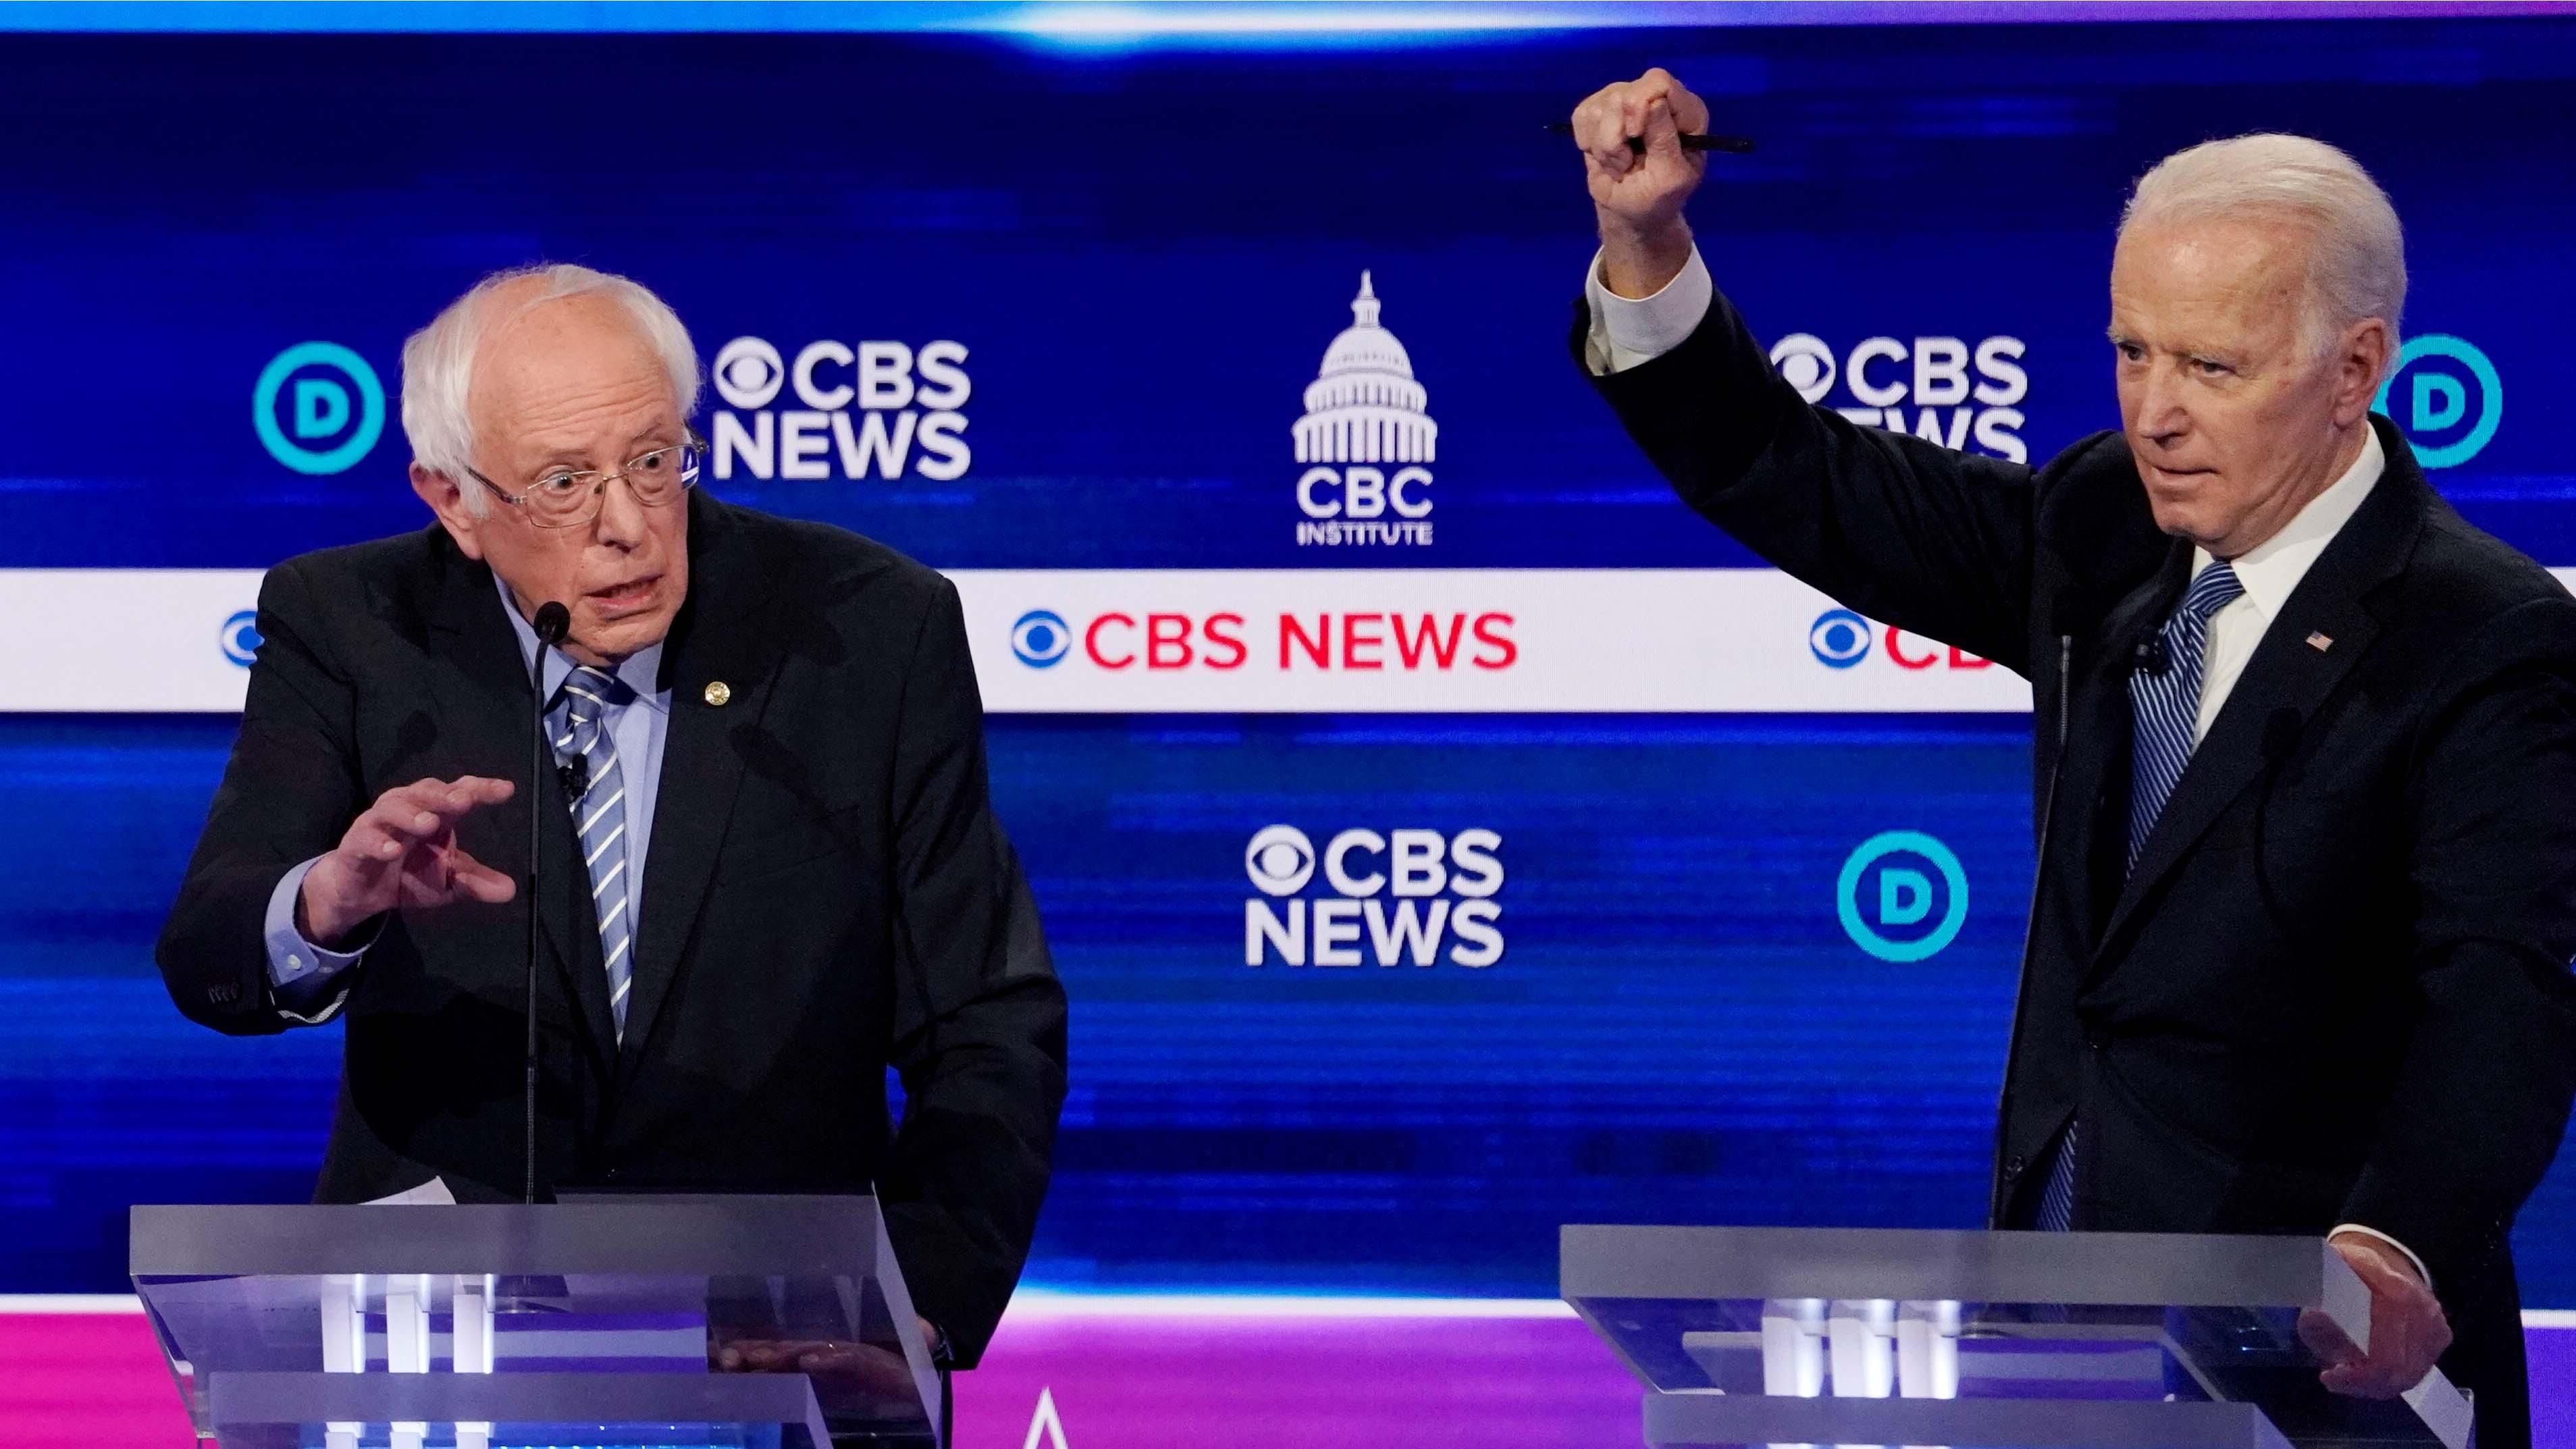 Democratic 2020 US presidential candidates Sen. Bernie Sanders and former Vice President Joe Biden participate in the tenth Democratic 2020 presidential debate at the Gaillard Center in Charleston, South Carolina, Feb. 25, 2020.